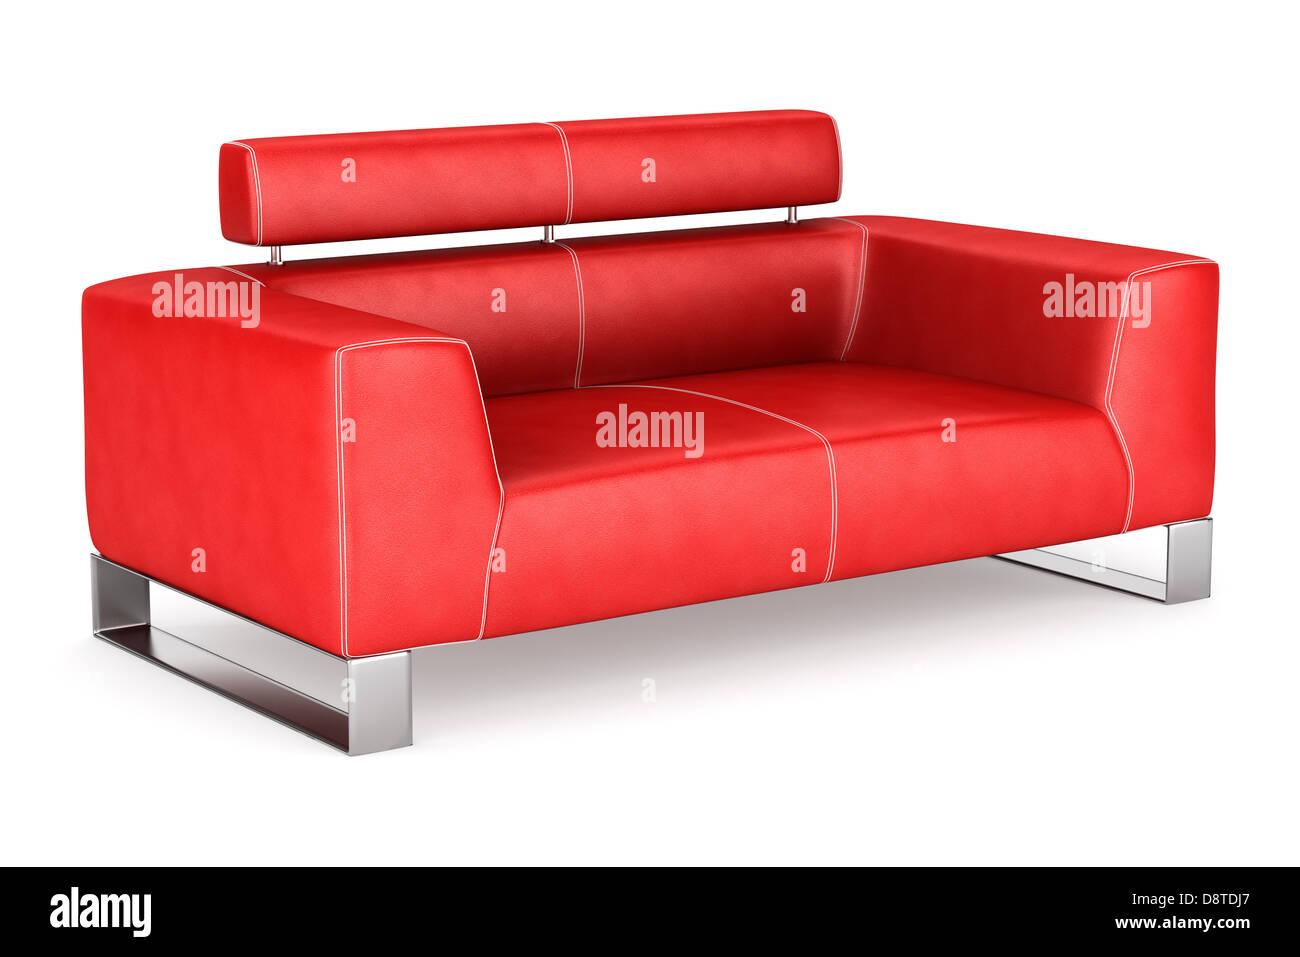 modernen roten Ledercouch isoliert auf weiss Stockbild